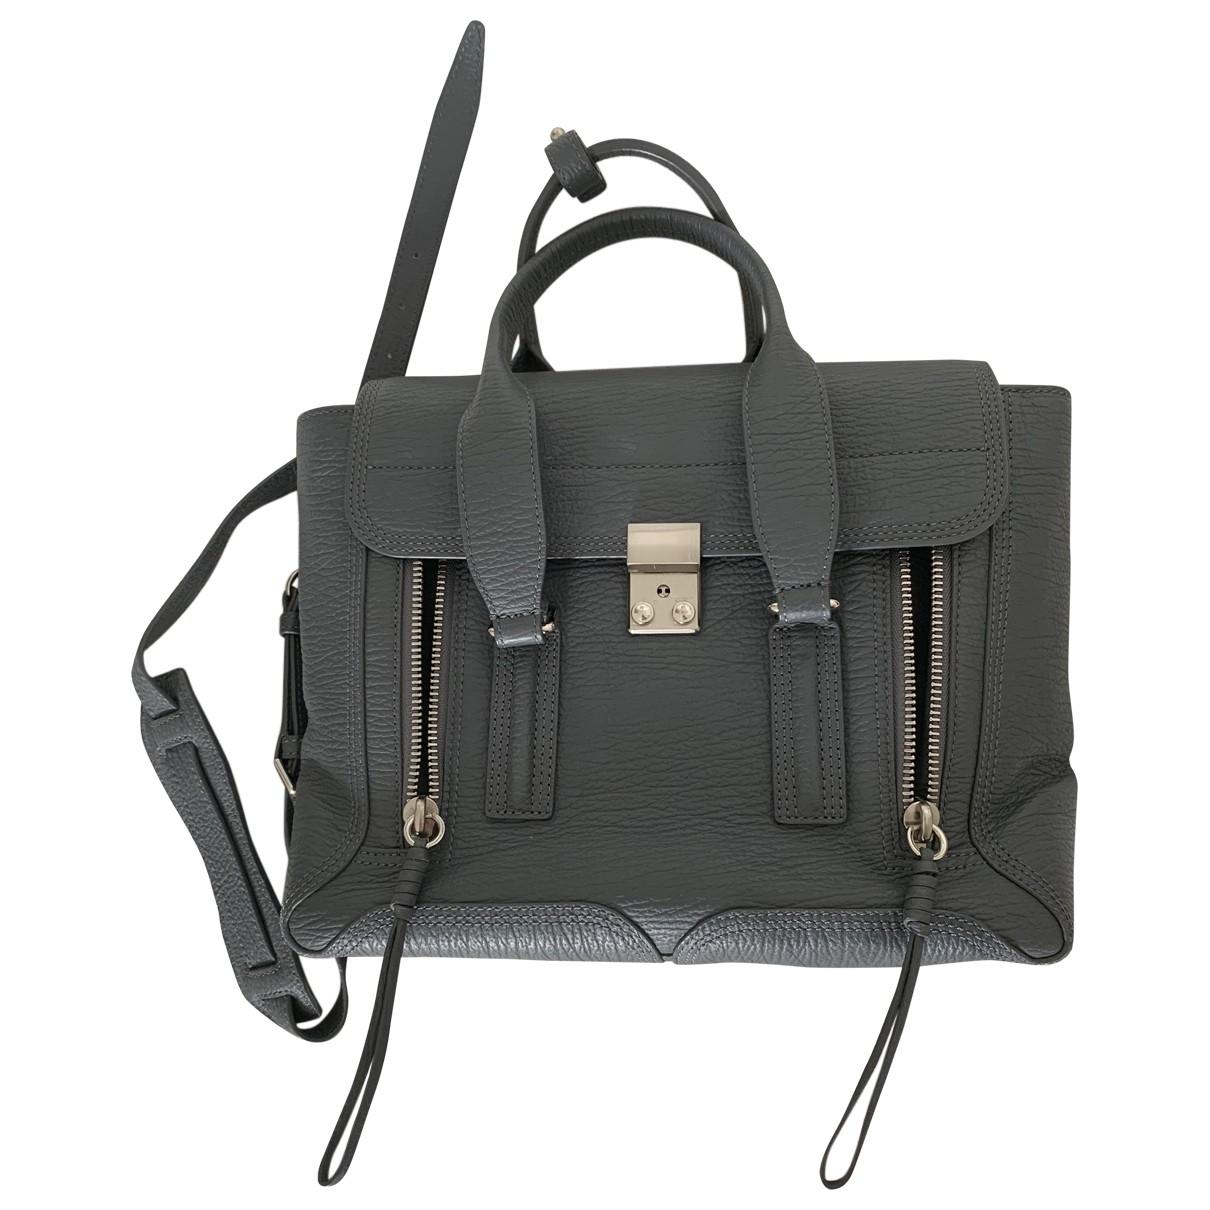 3.1 Phillip Lim Pashli Handtasche in  Grau Leder